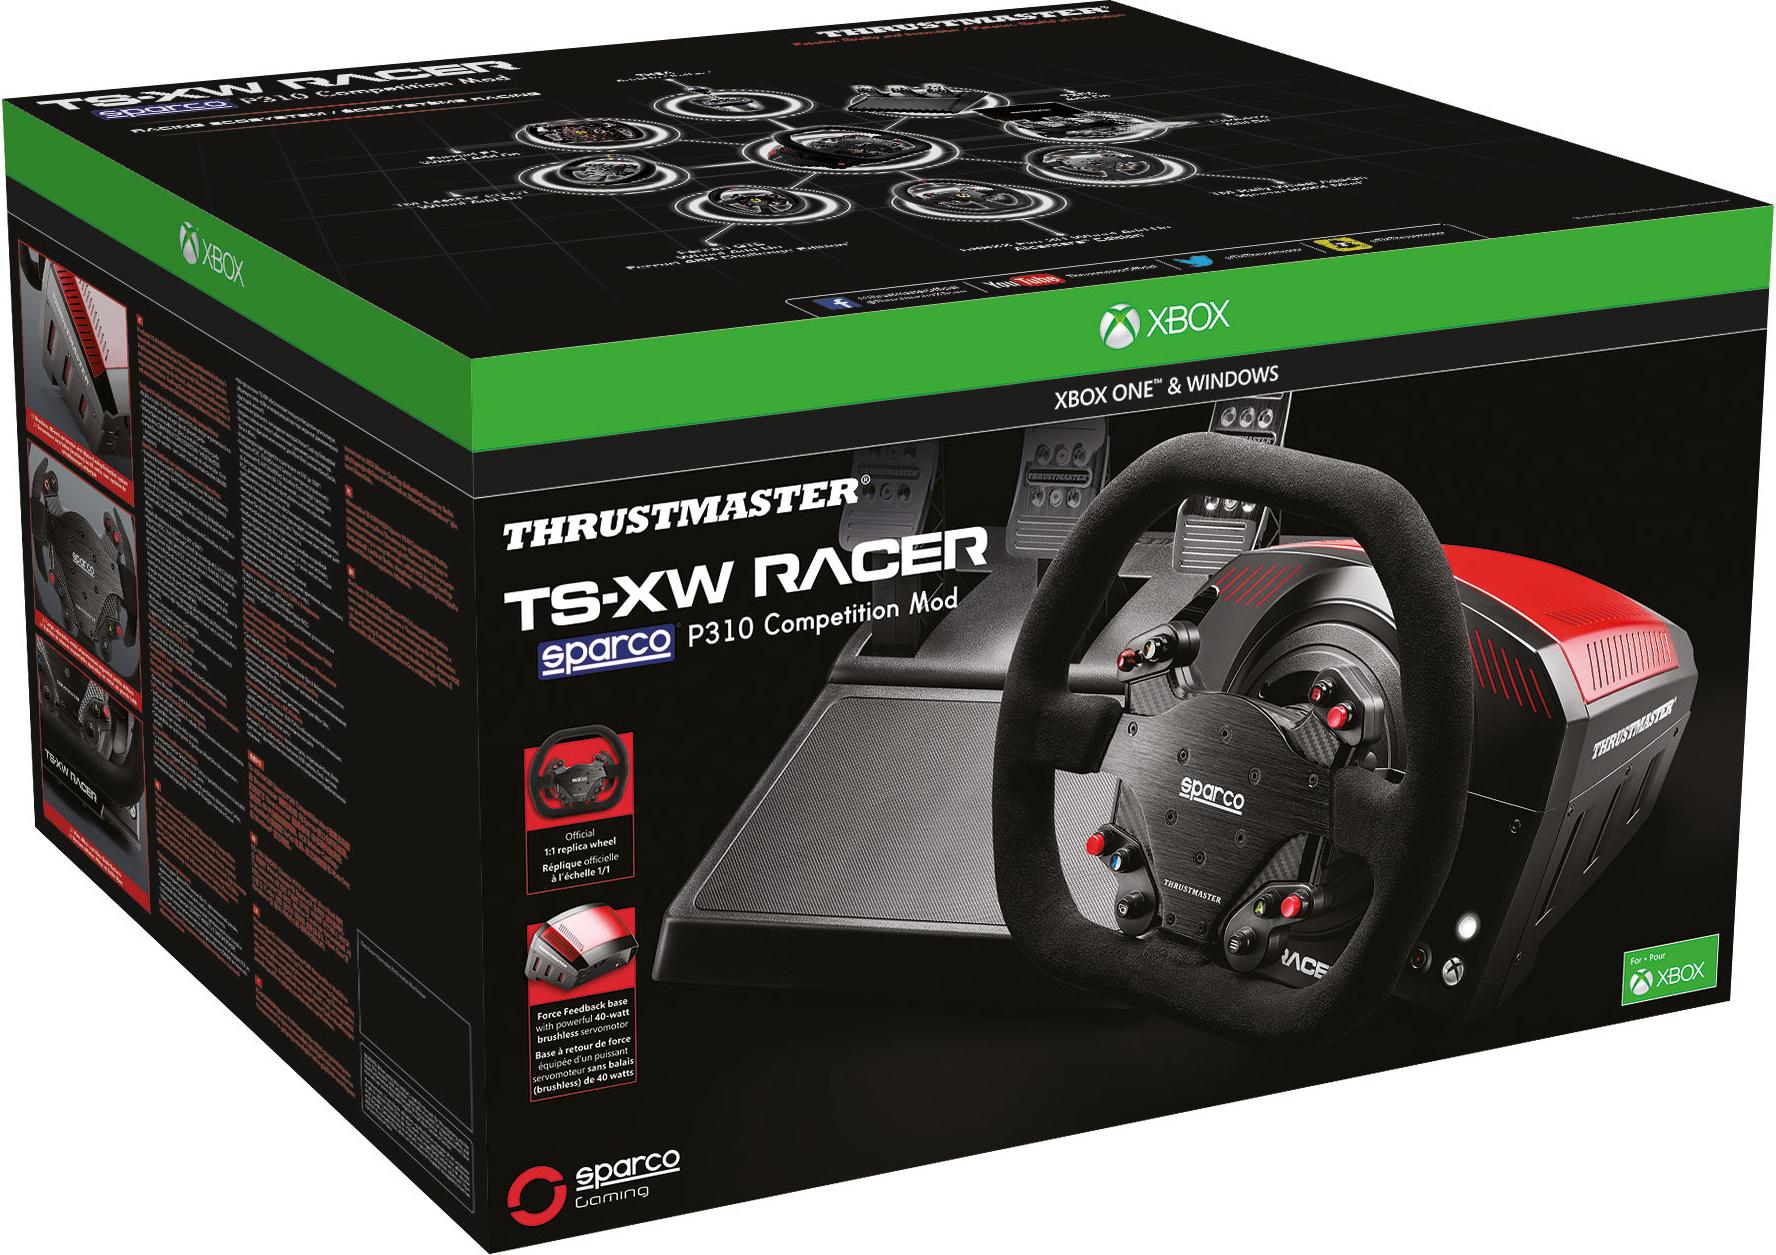 Руль Thrustmaster TS-XW Racer Sparco P310 Competition Mod Xbox One / PCЗакажите руль Thrustmaster TS-XW Racer Sparco P310 Competition Mod и получите 2500 бонусов на вашу карту.<br>